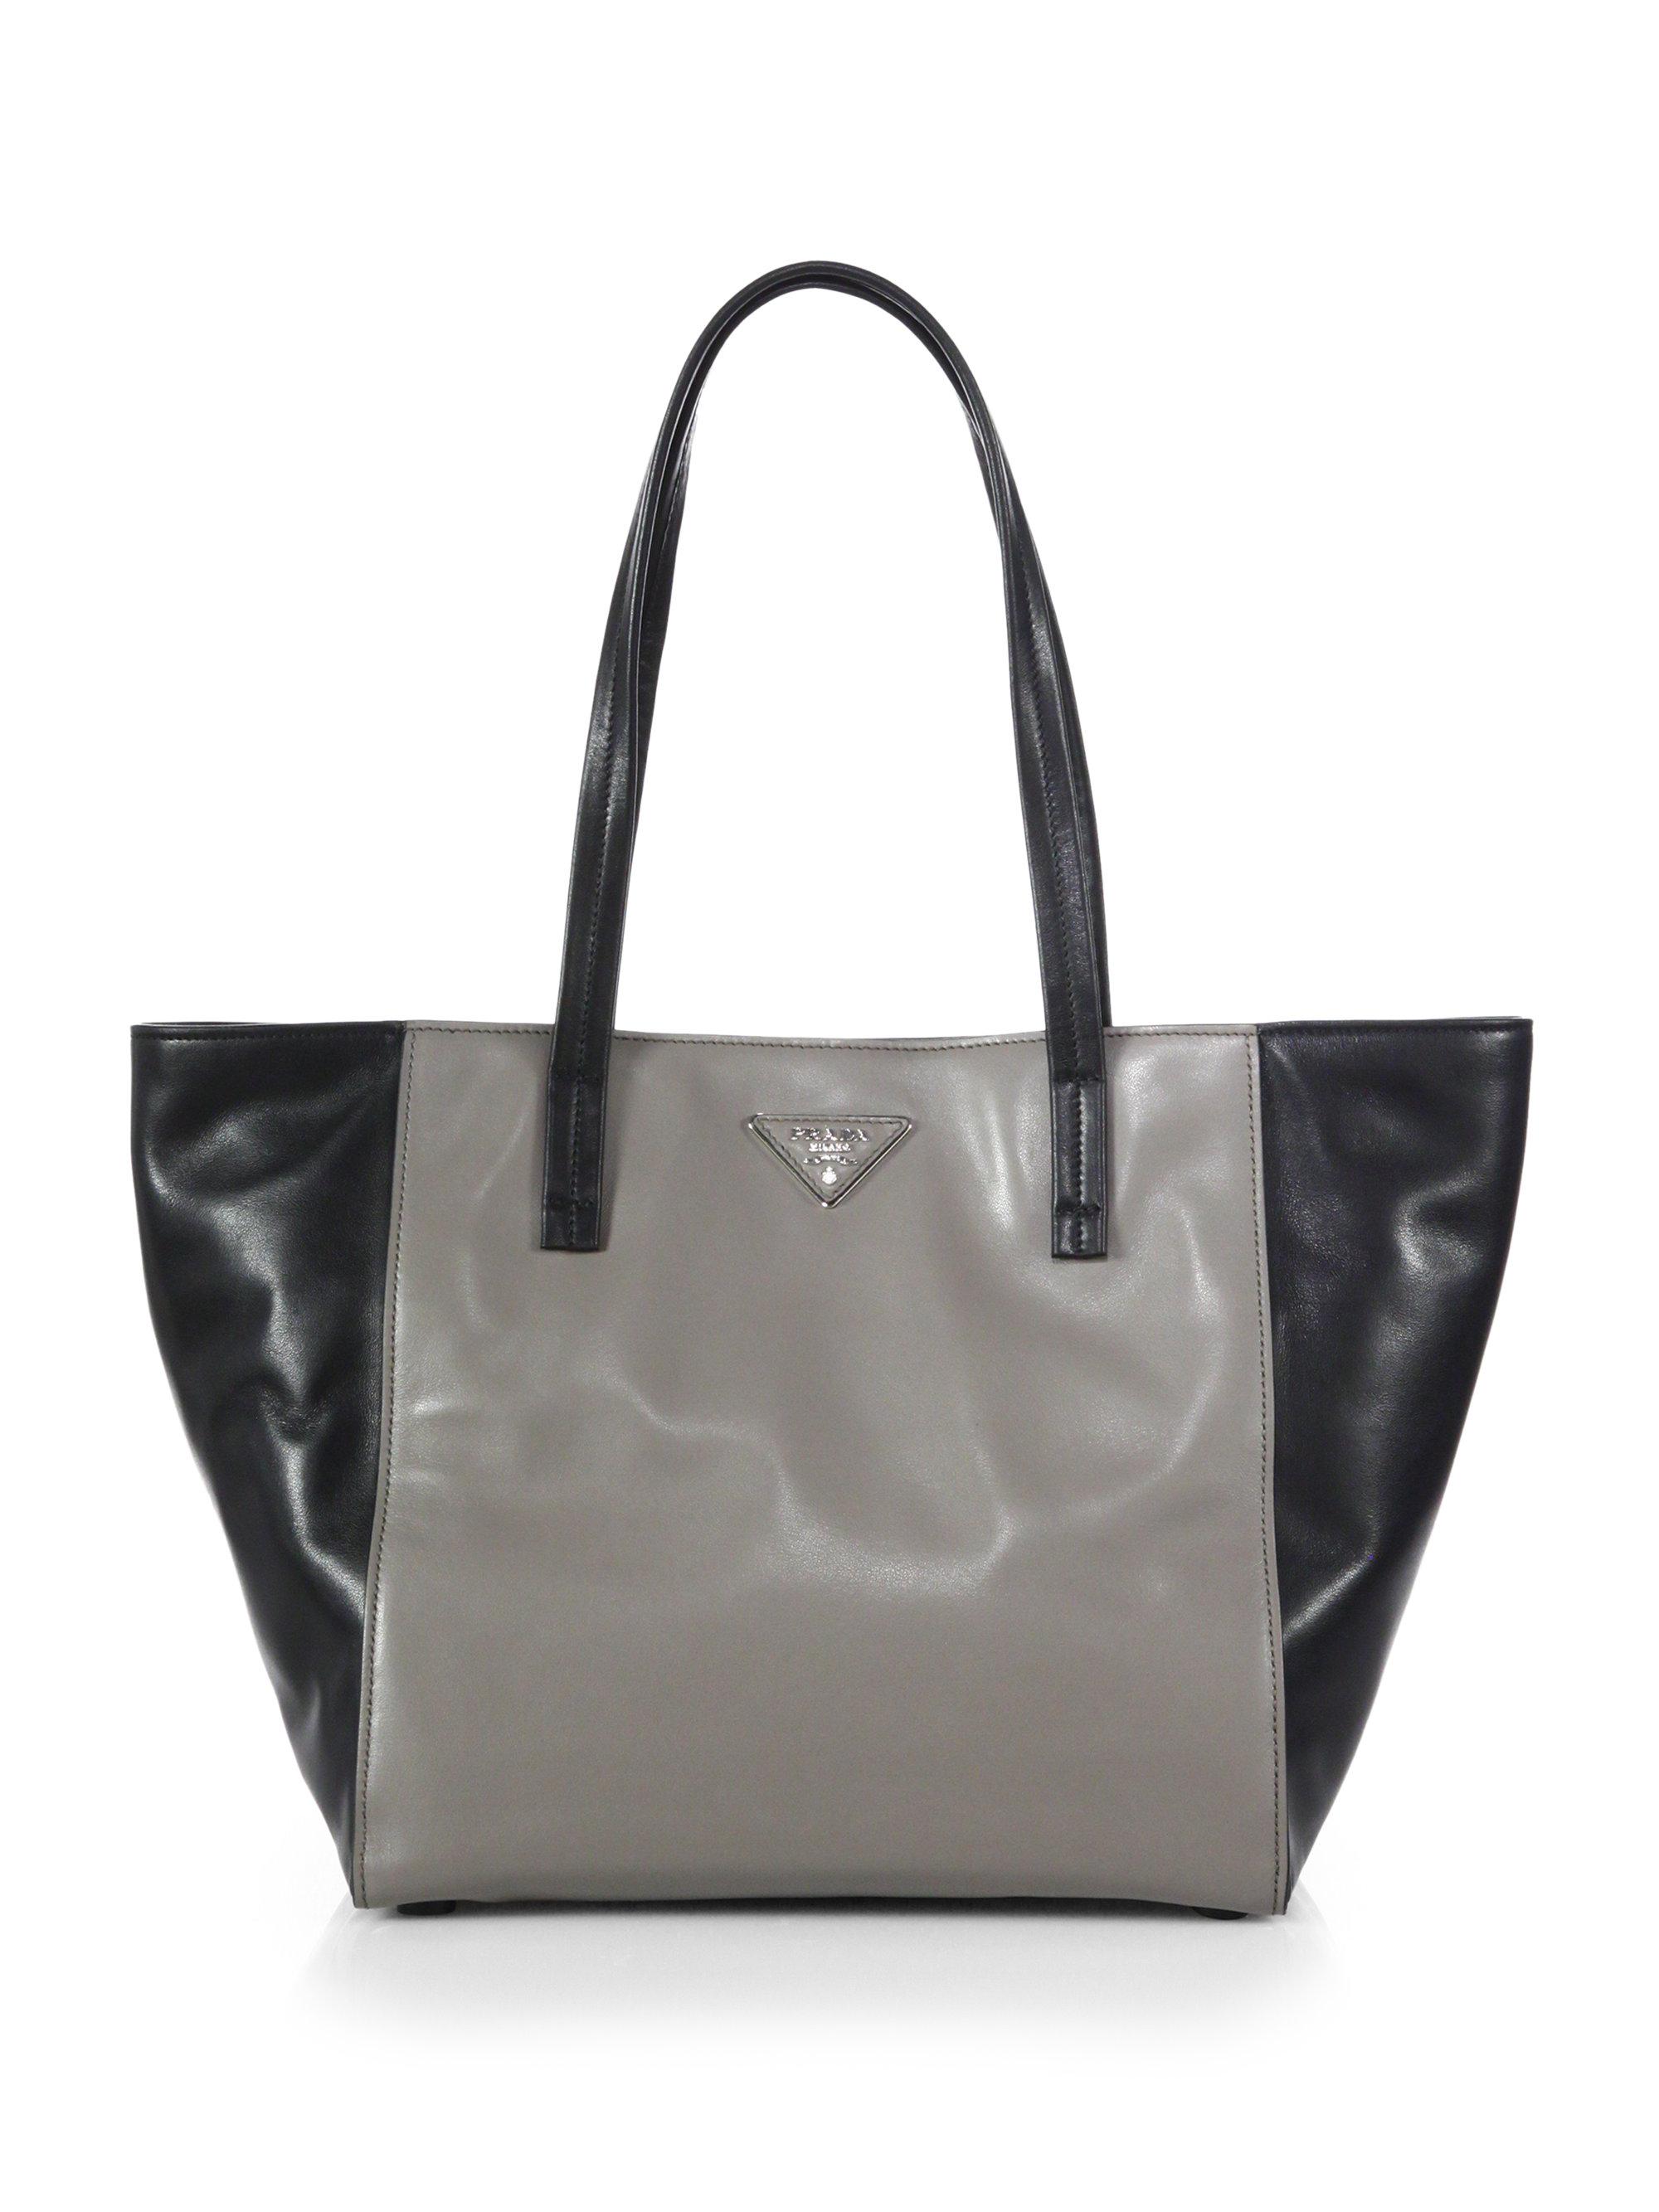 Prada Soft Calf Two-Tone Leather Shoulder Tote in Black (GREY ...